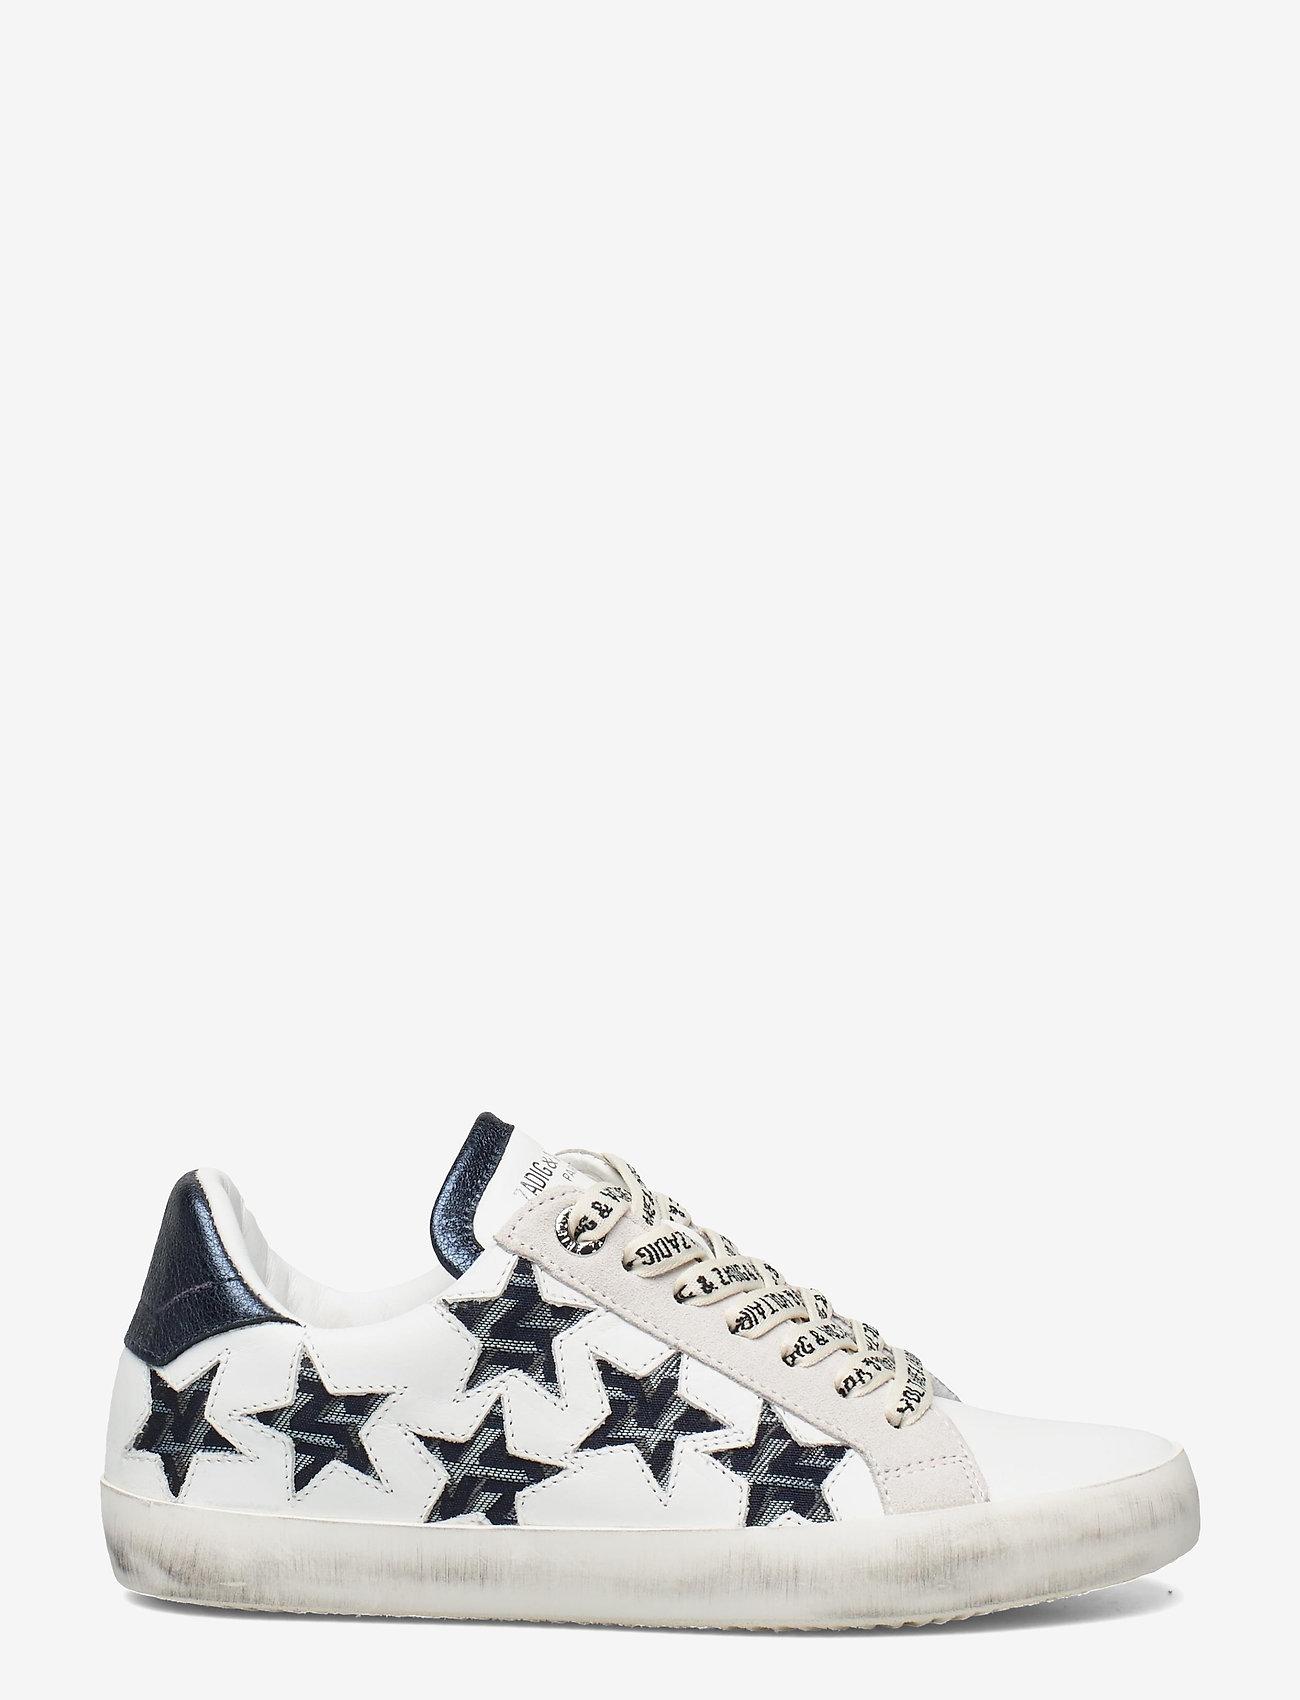 Zadig & Voltaire - ZADIG USED STARS MONOGRAM - lave sneakers - blanc acier - 1